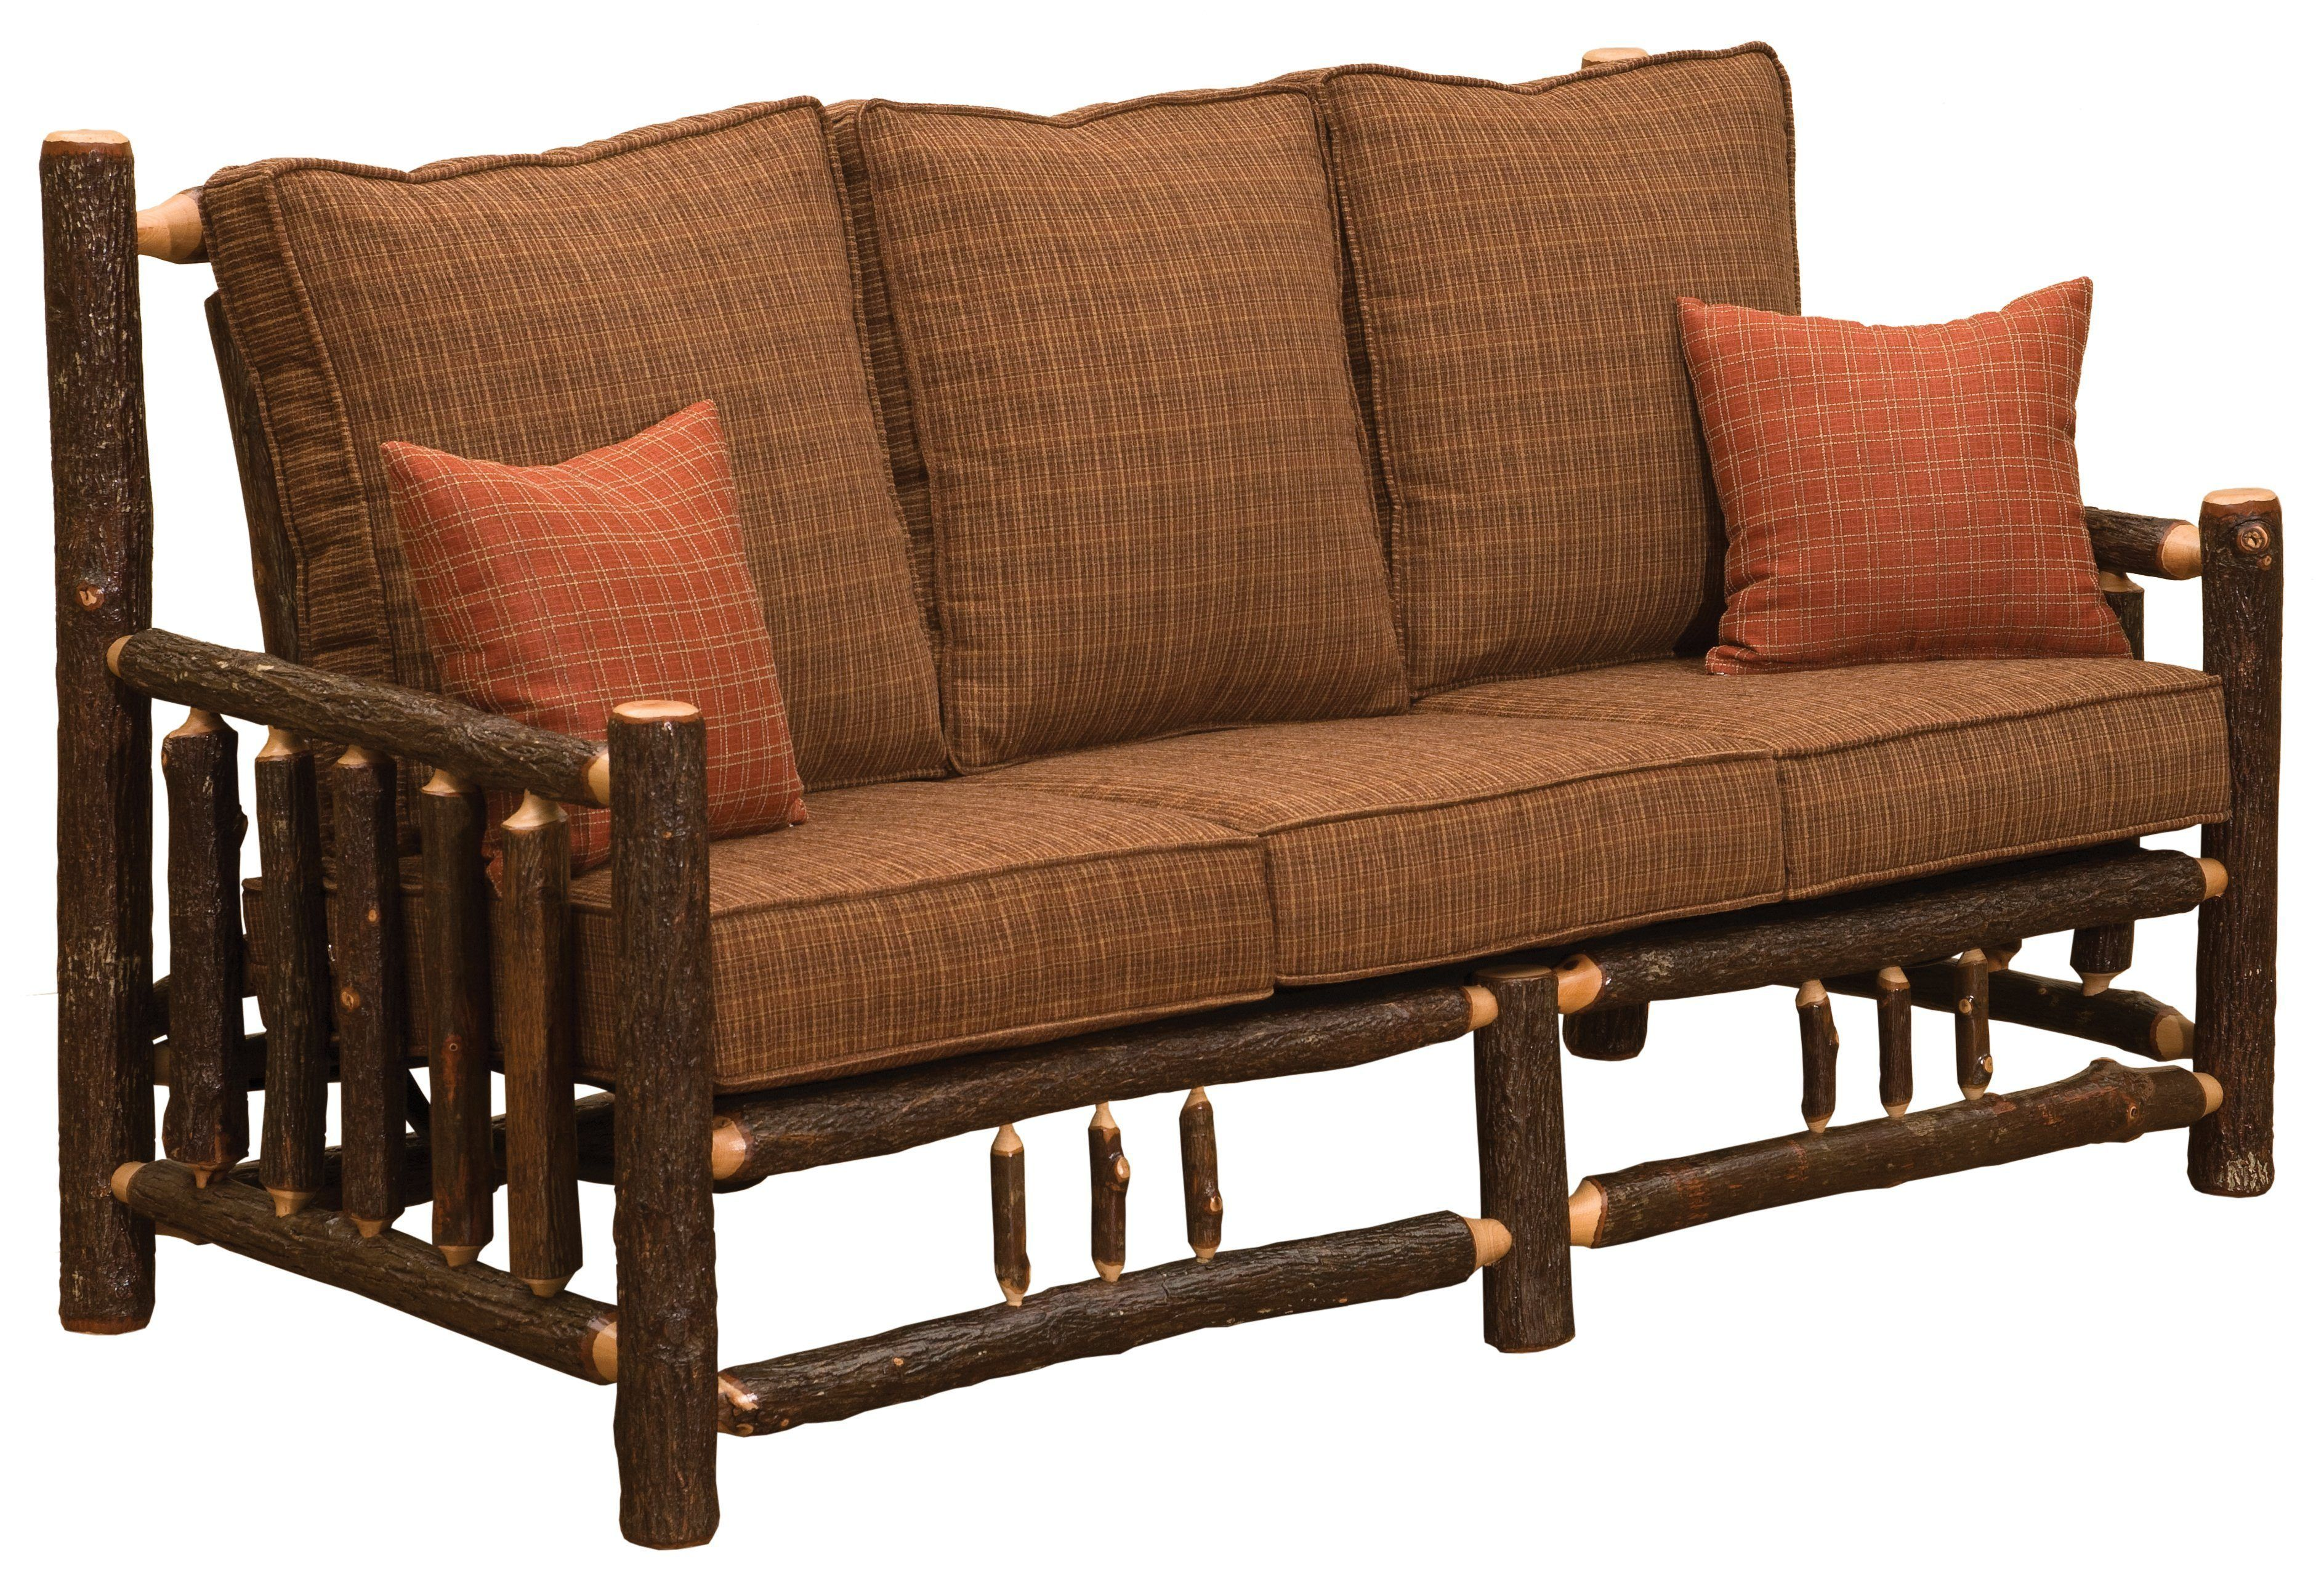 Natural Hickory Log Frame Sofa Includes Fabric and